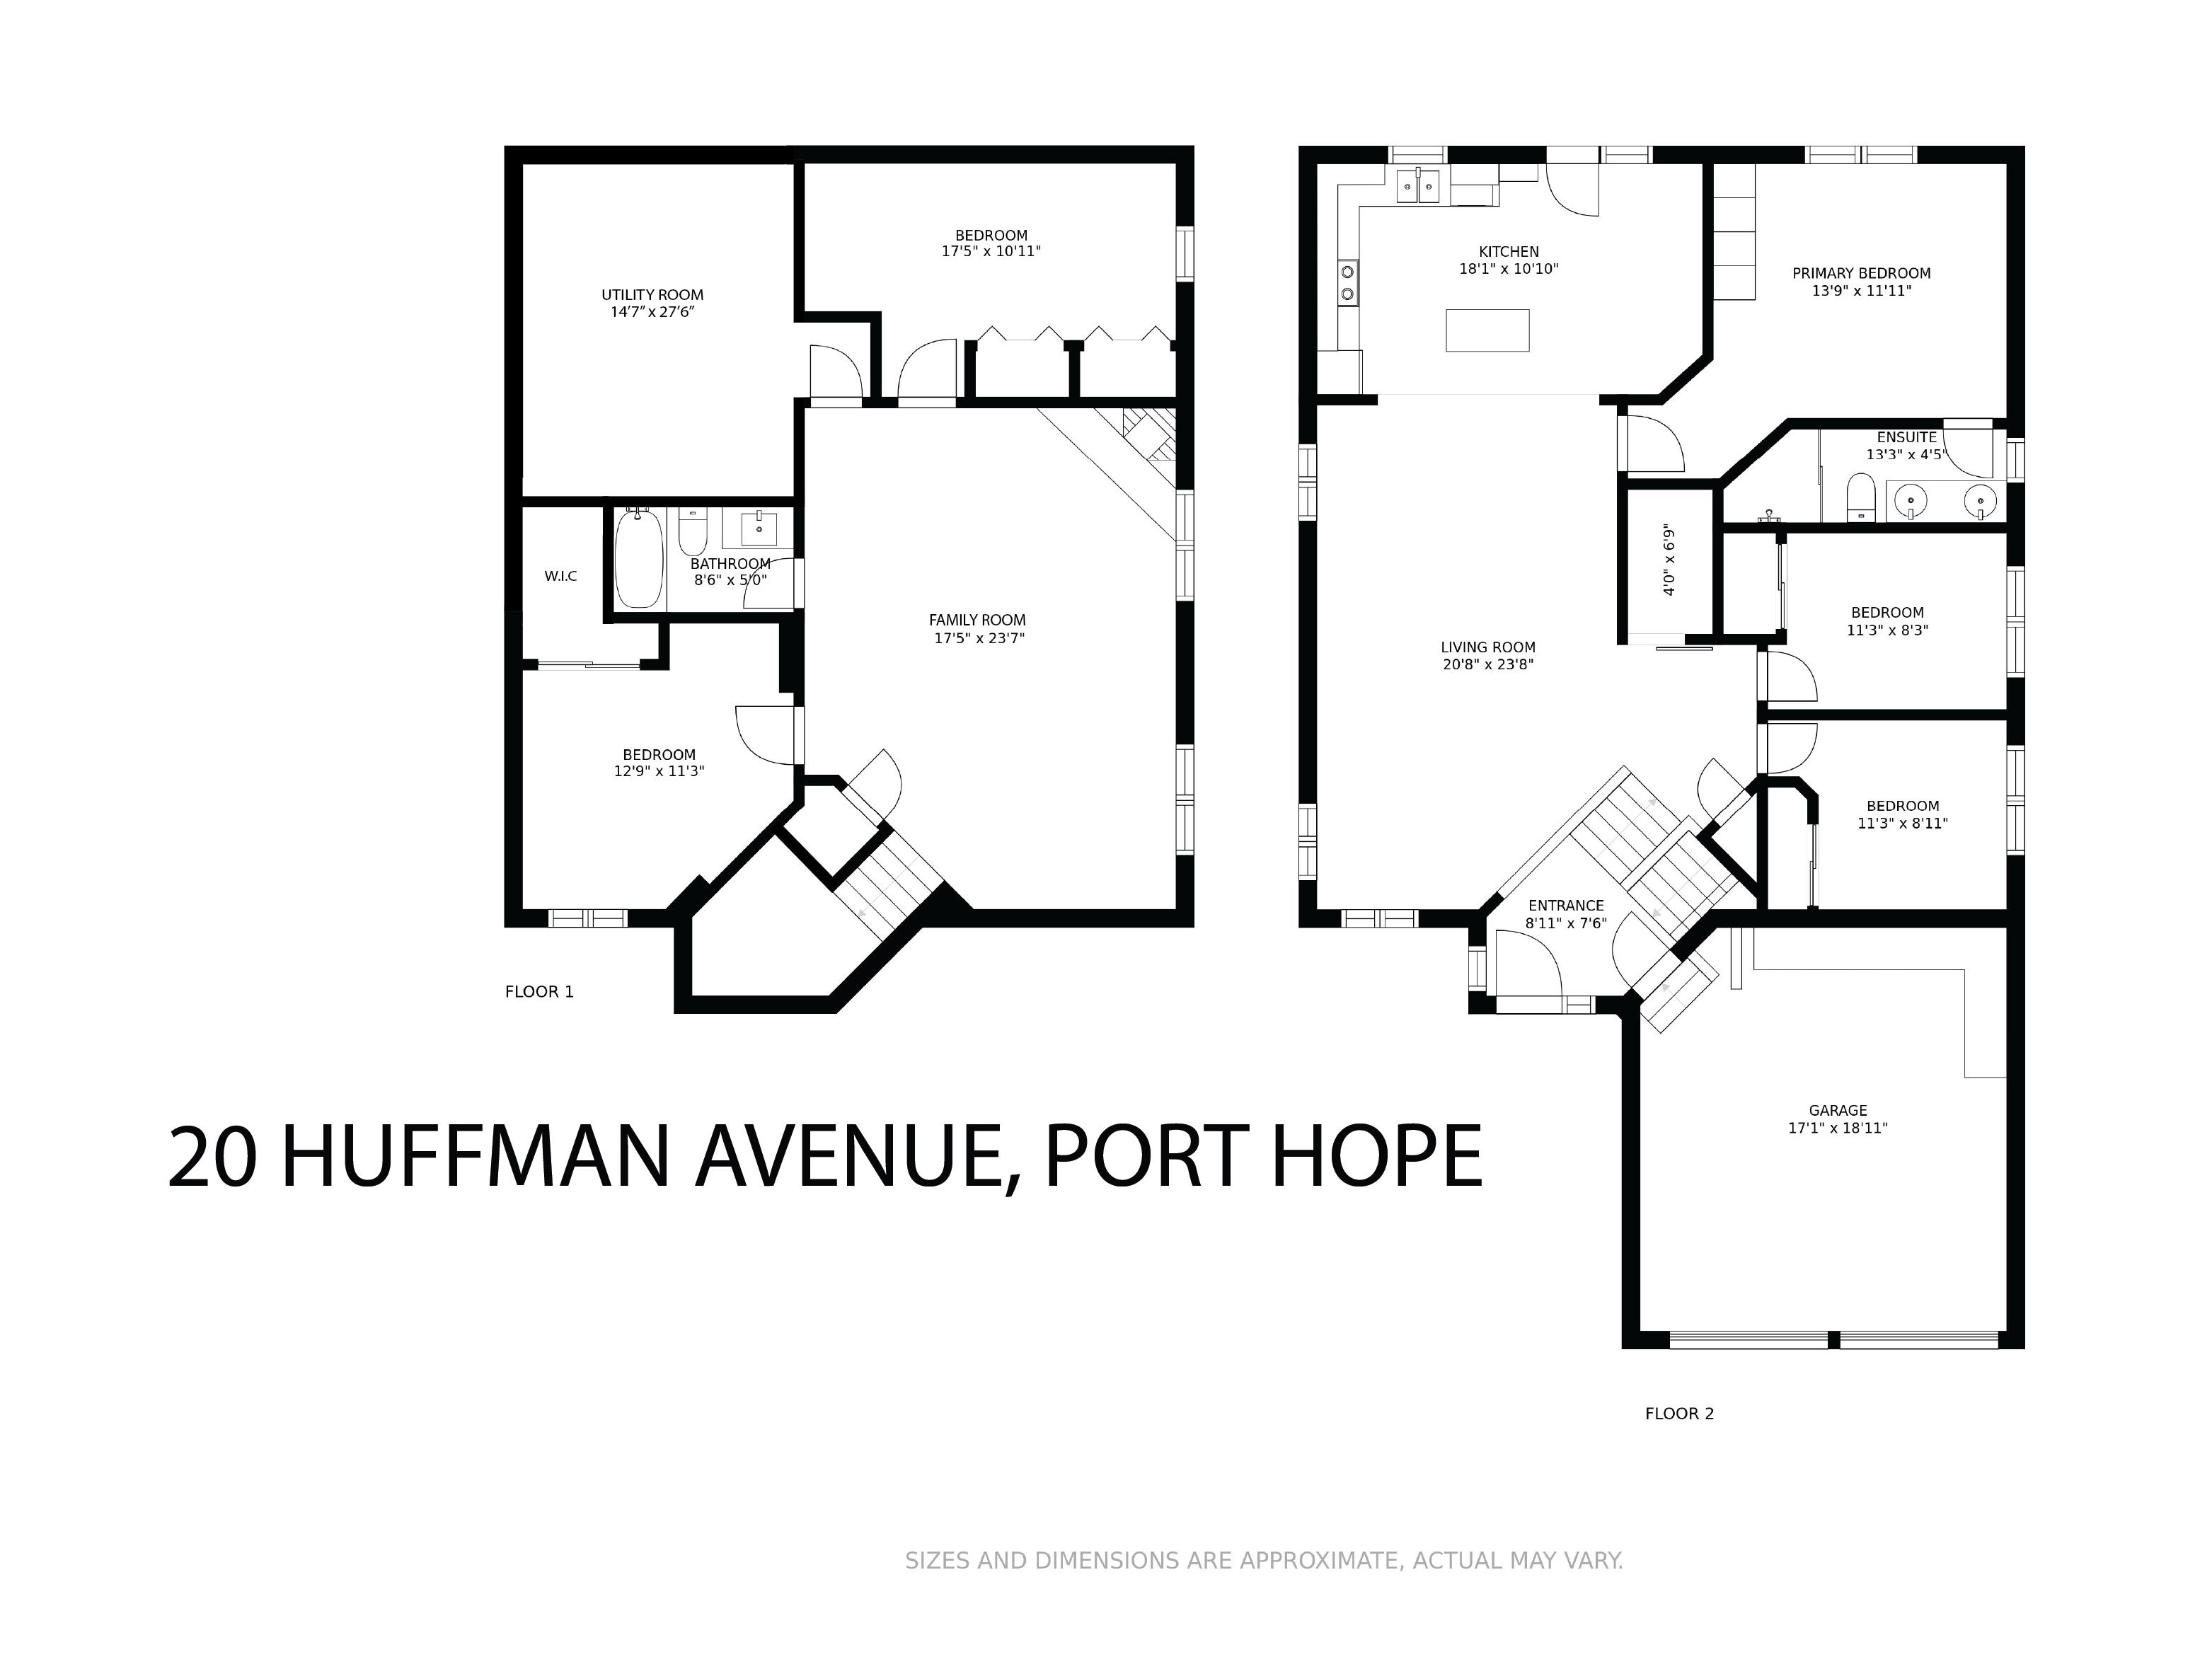 20 Huffman Avenue floorplan